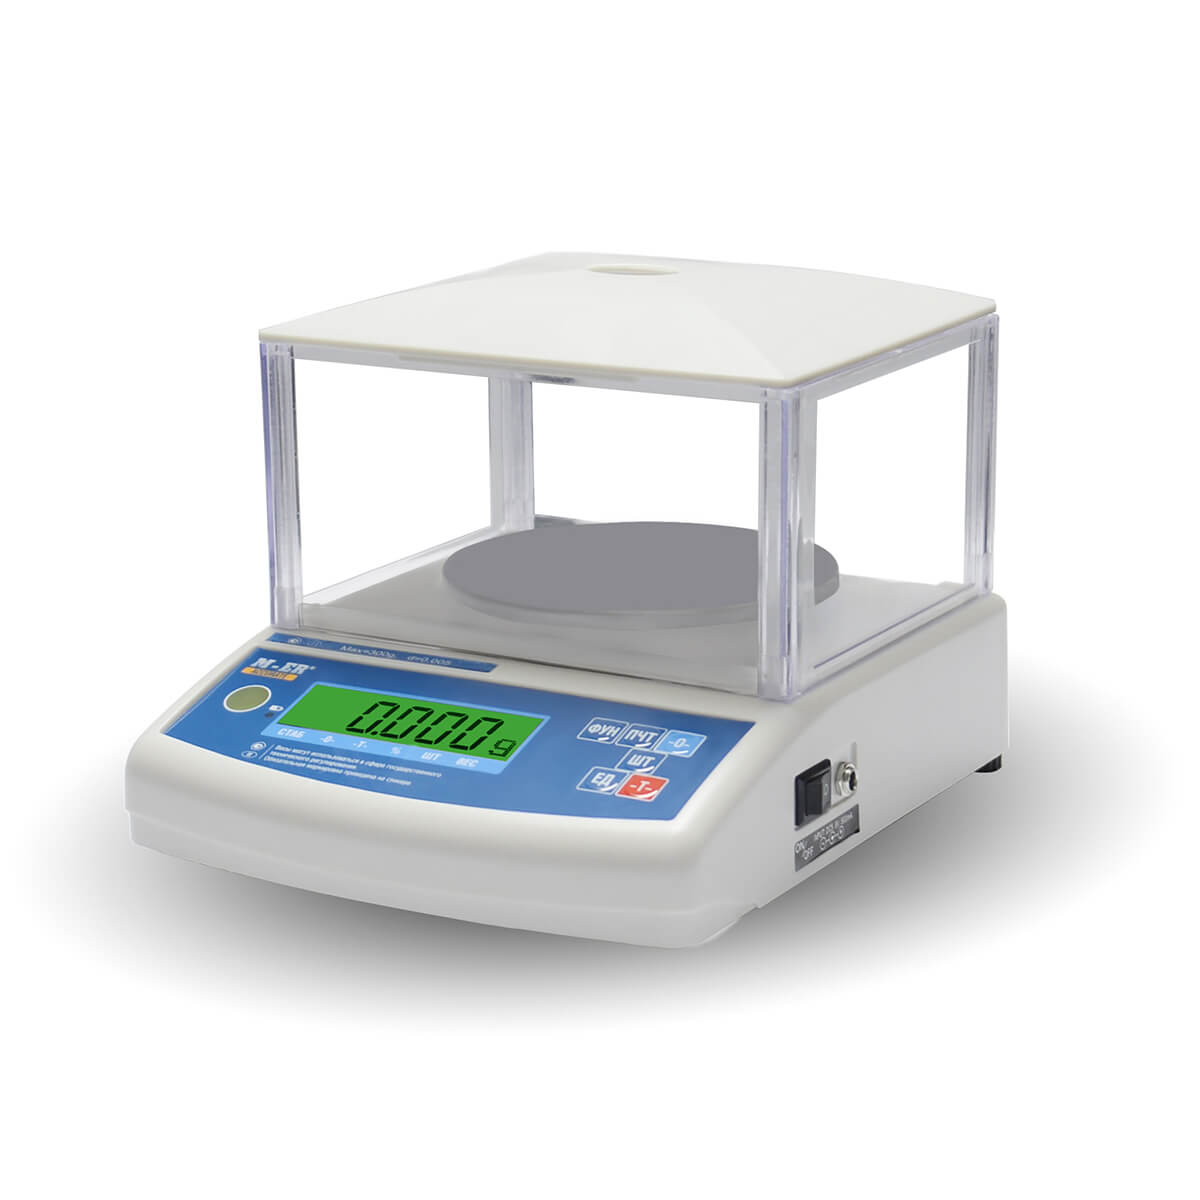 Лабораторные весы M-ER 122 АCFJR-300.01 «ACCURATE» LСD